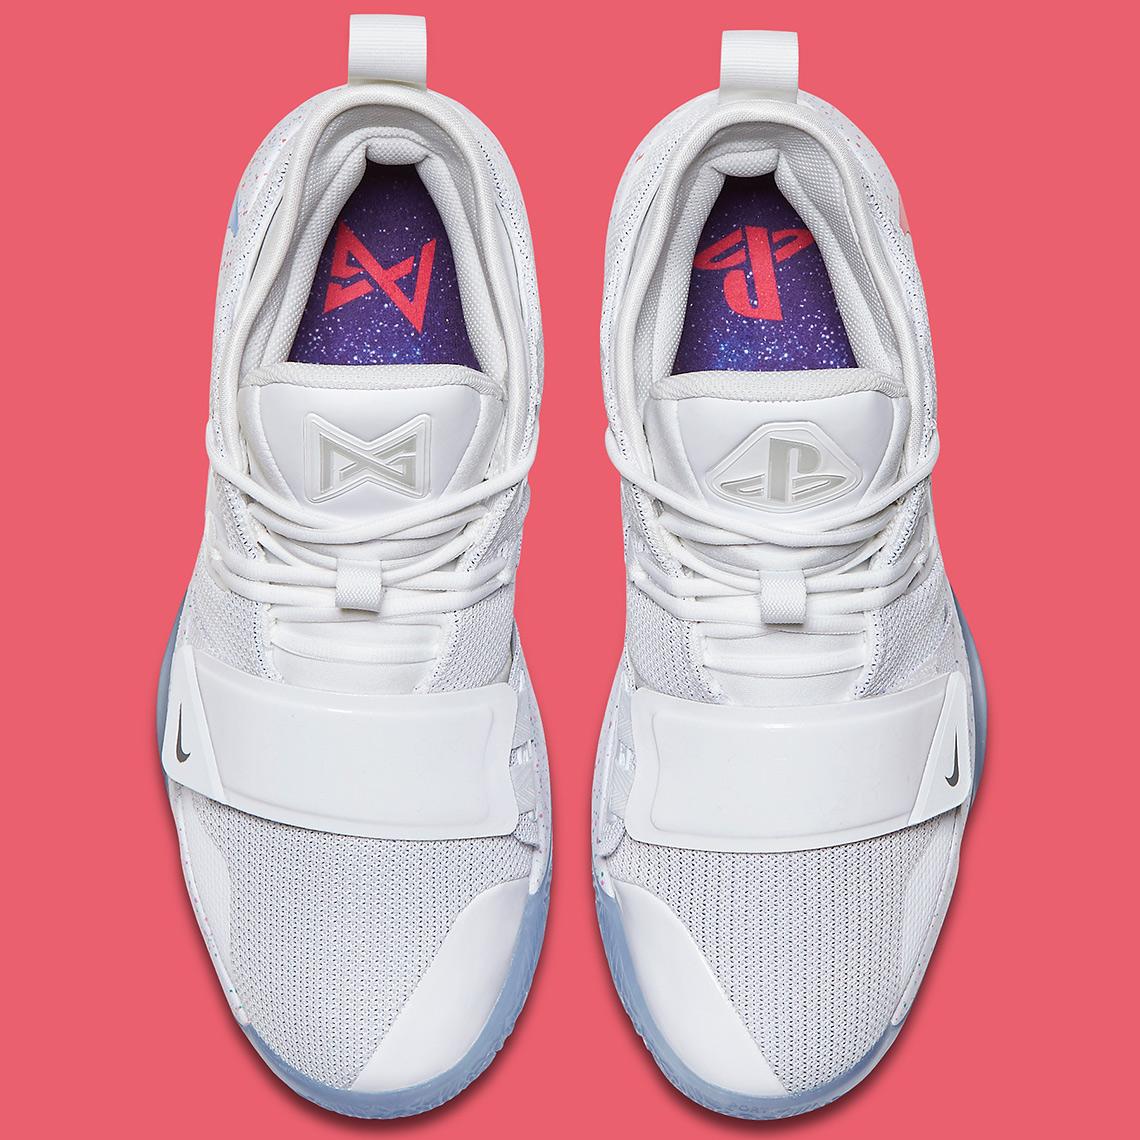 6bbd3b978a52 Nike PG 2.5 PlayStation BQ8388-100 Release Info